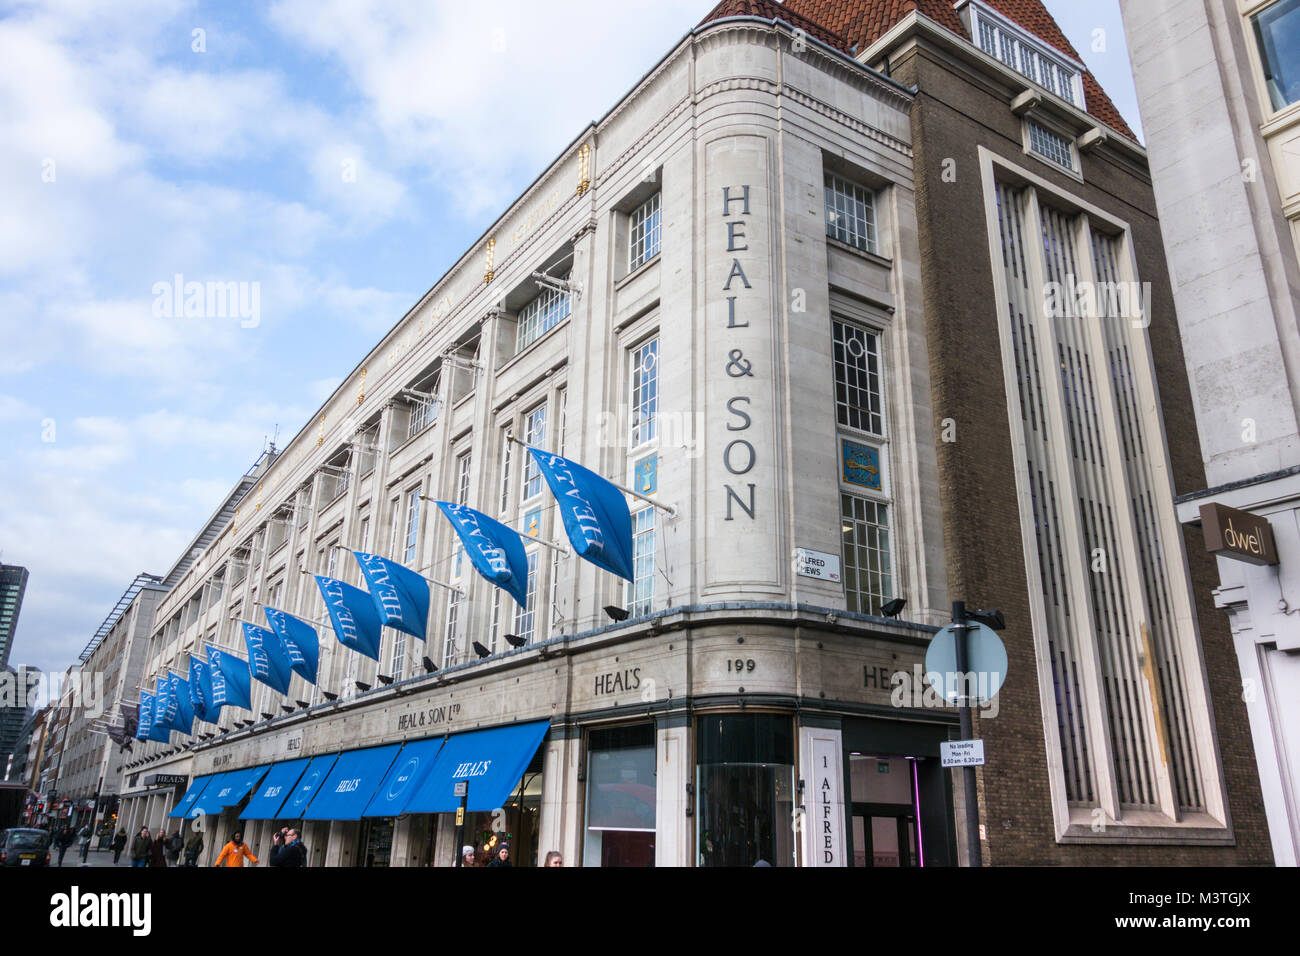 Heals & Son Department store on Tottenham Court Road, London, UK Stock Photo